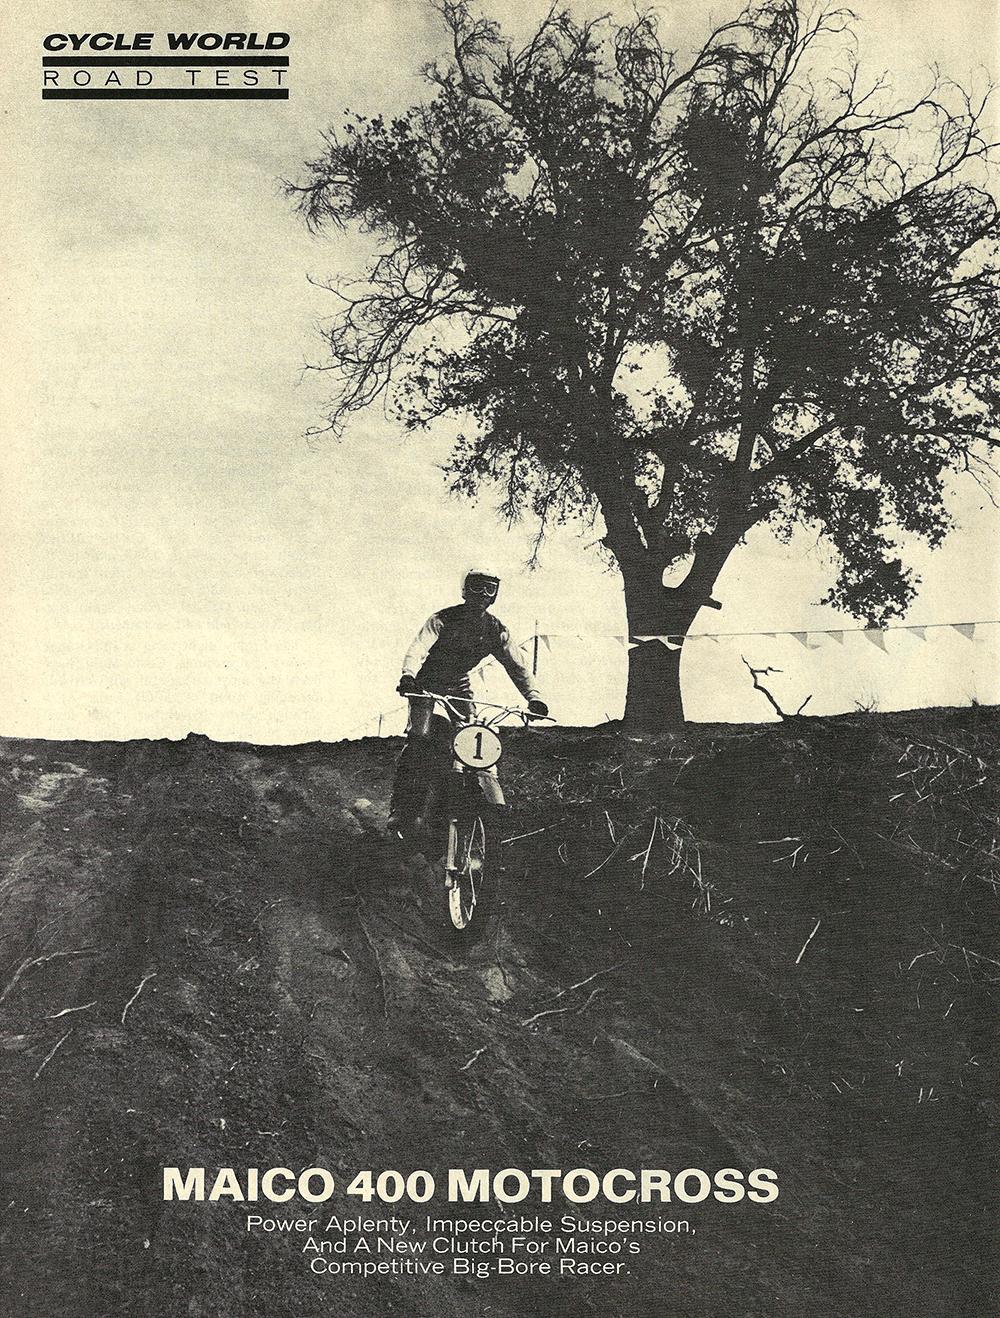 1971 Maico 400 Motocross road test — Ye Olde Cycle Shoppe